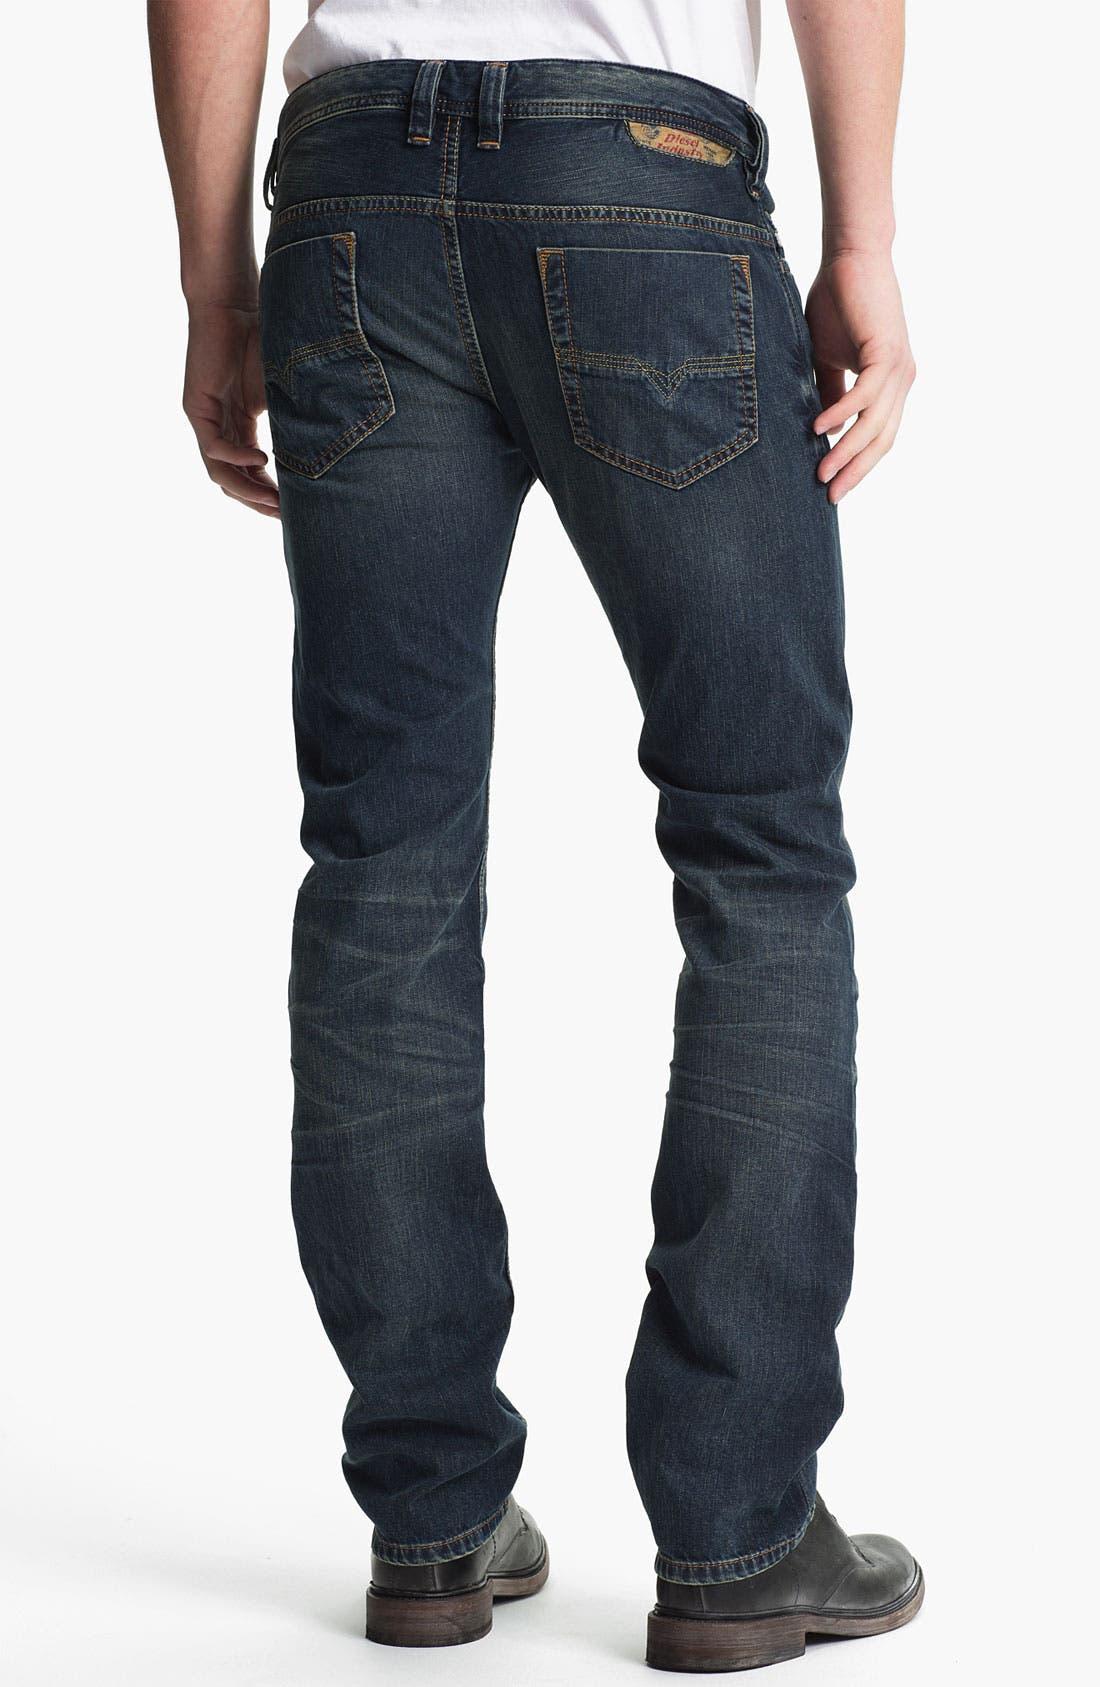 Alternate Image 1 Selected - DIESEL® 'Safado' Straight Leg Jeans (0807U)